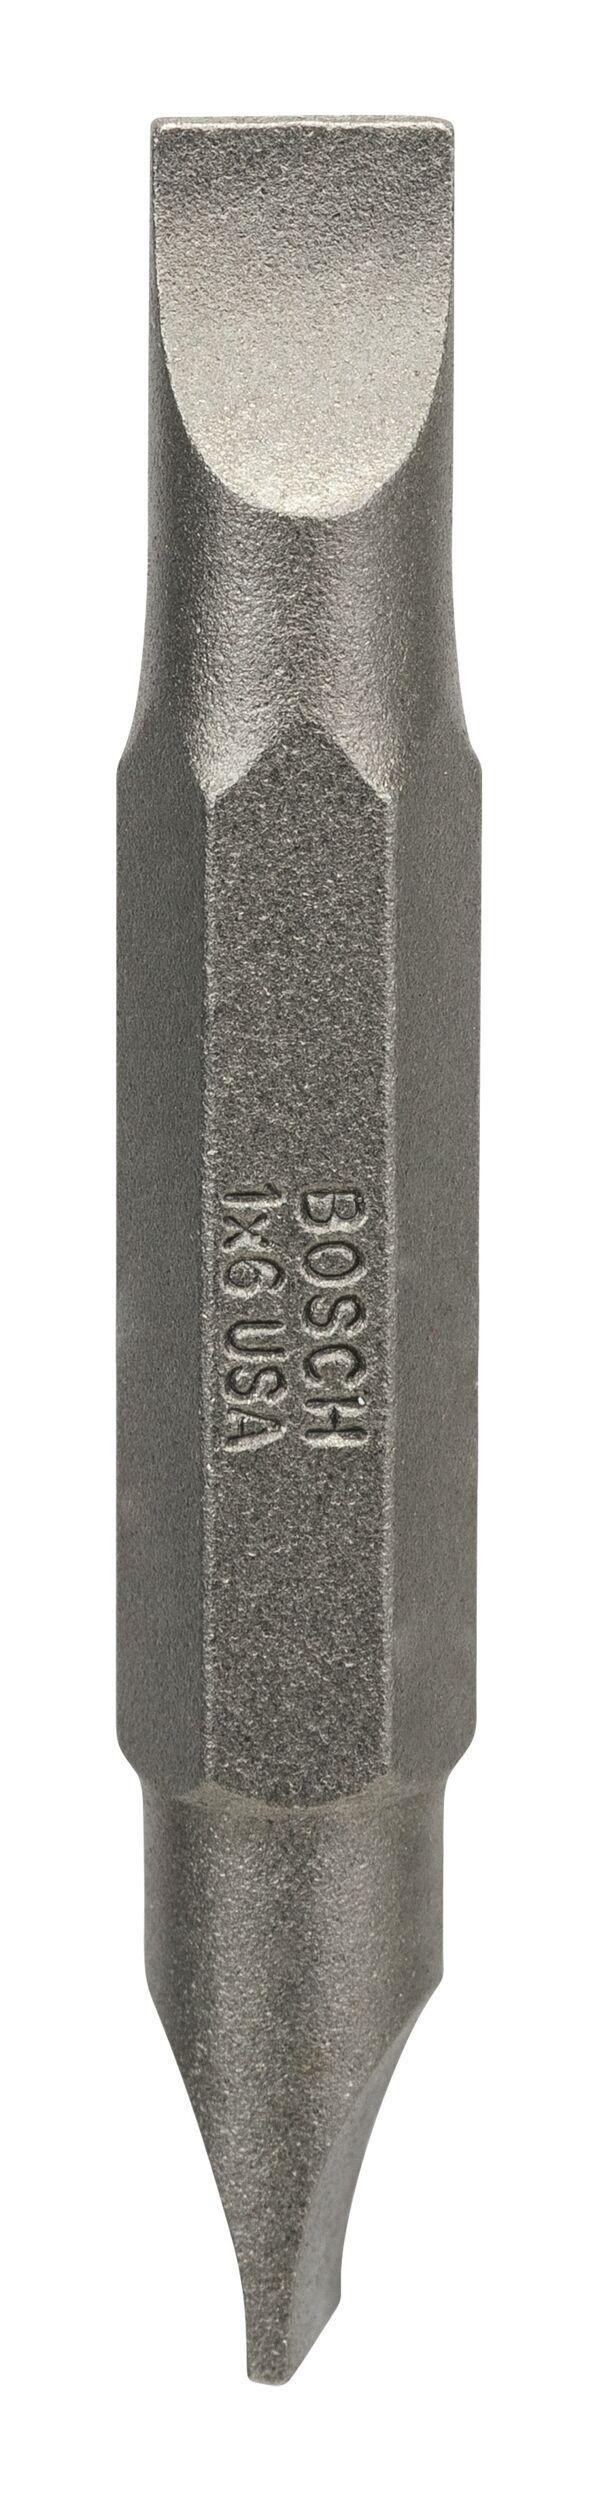 Bosch Zubehör Doppelklingenbit S1, 0 x 6, S1, 0 x 6, 45 mm 2607001737 (VPE: 10 Stück)